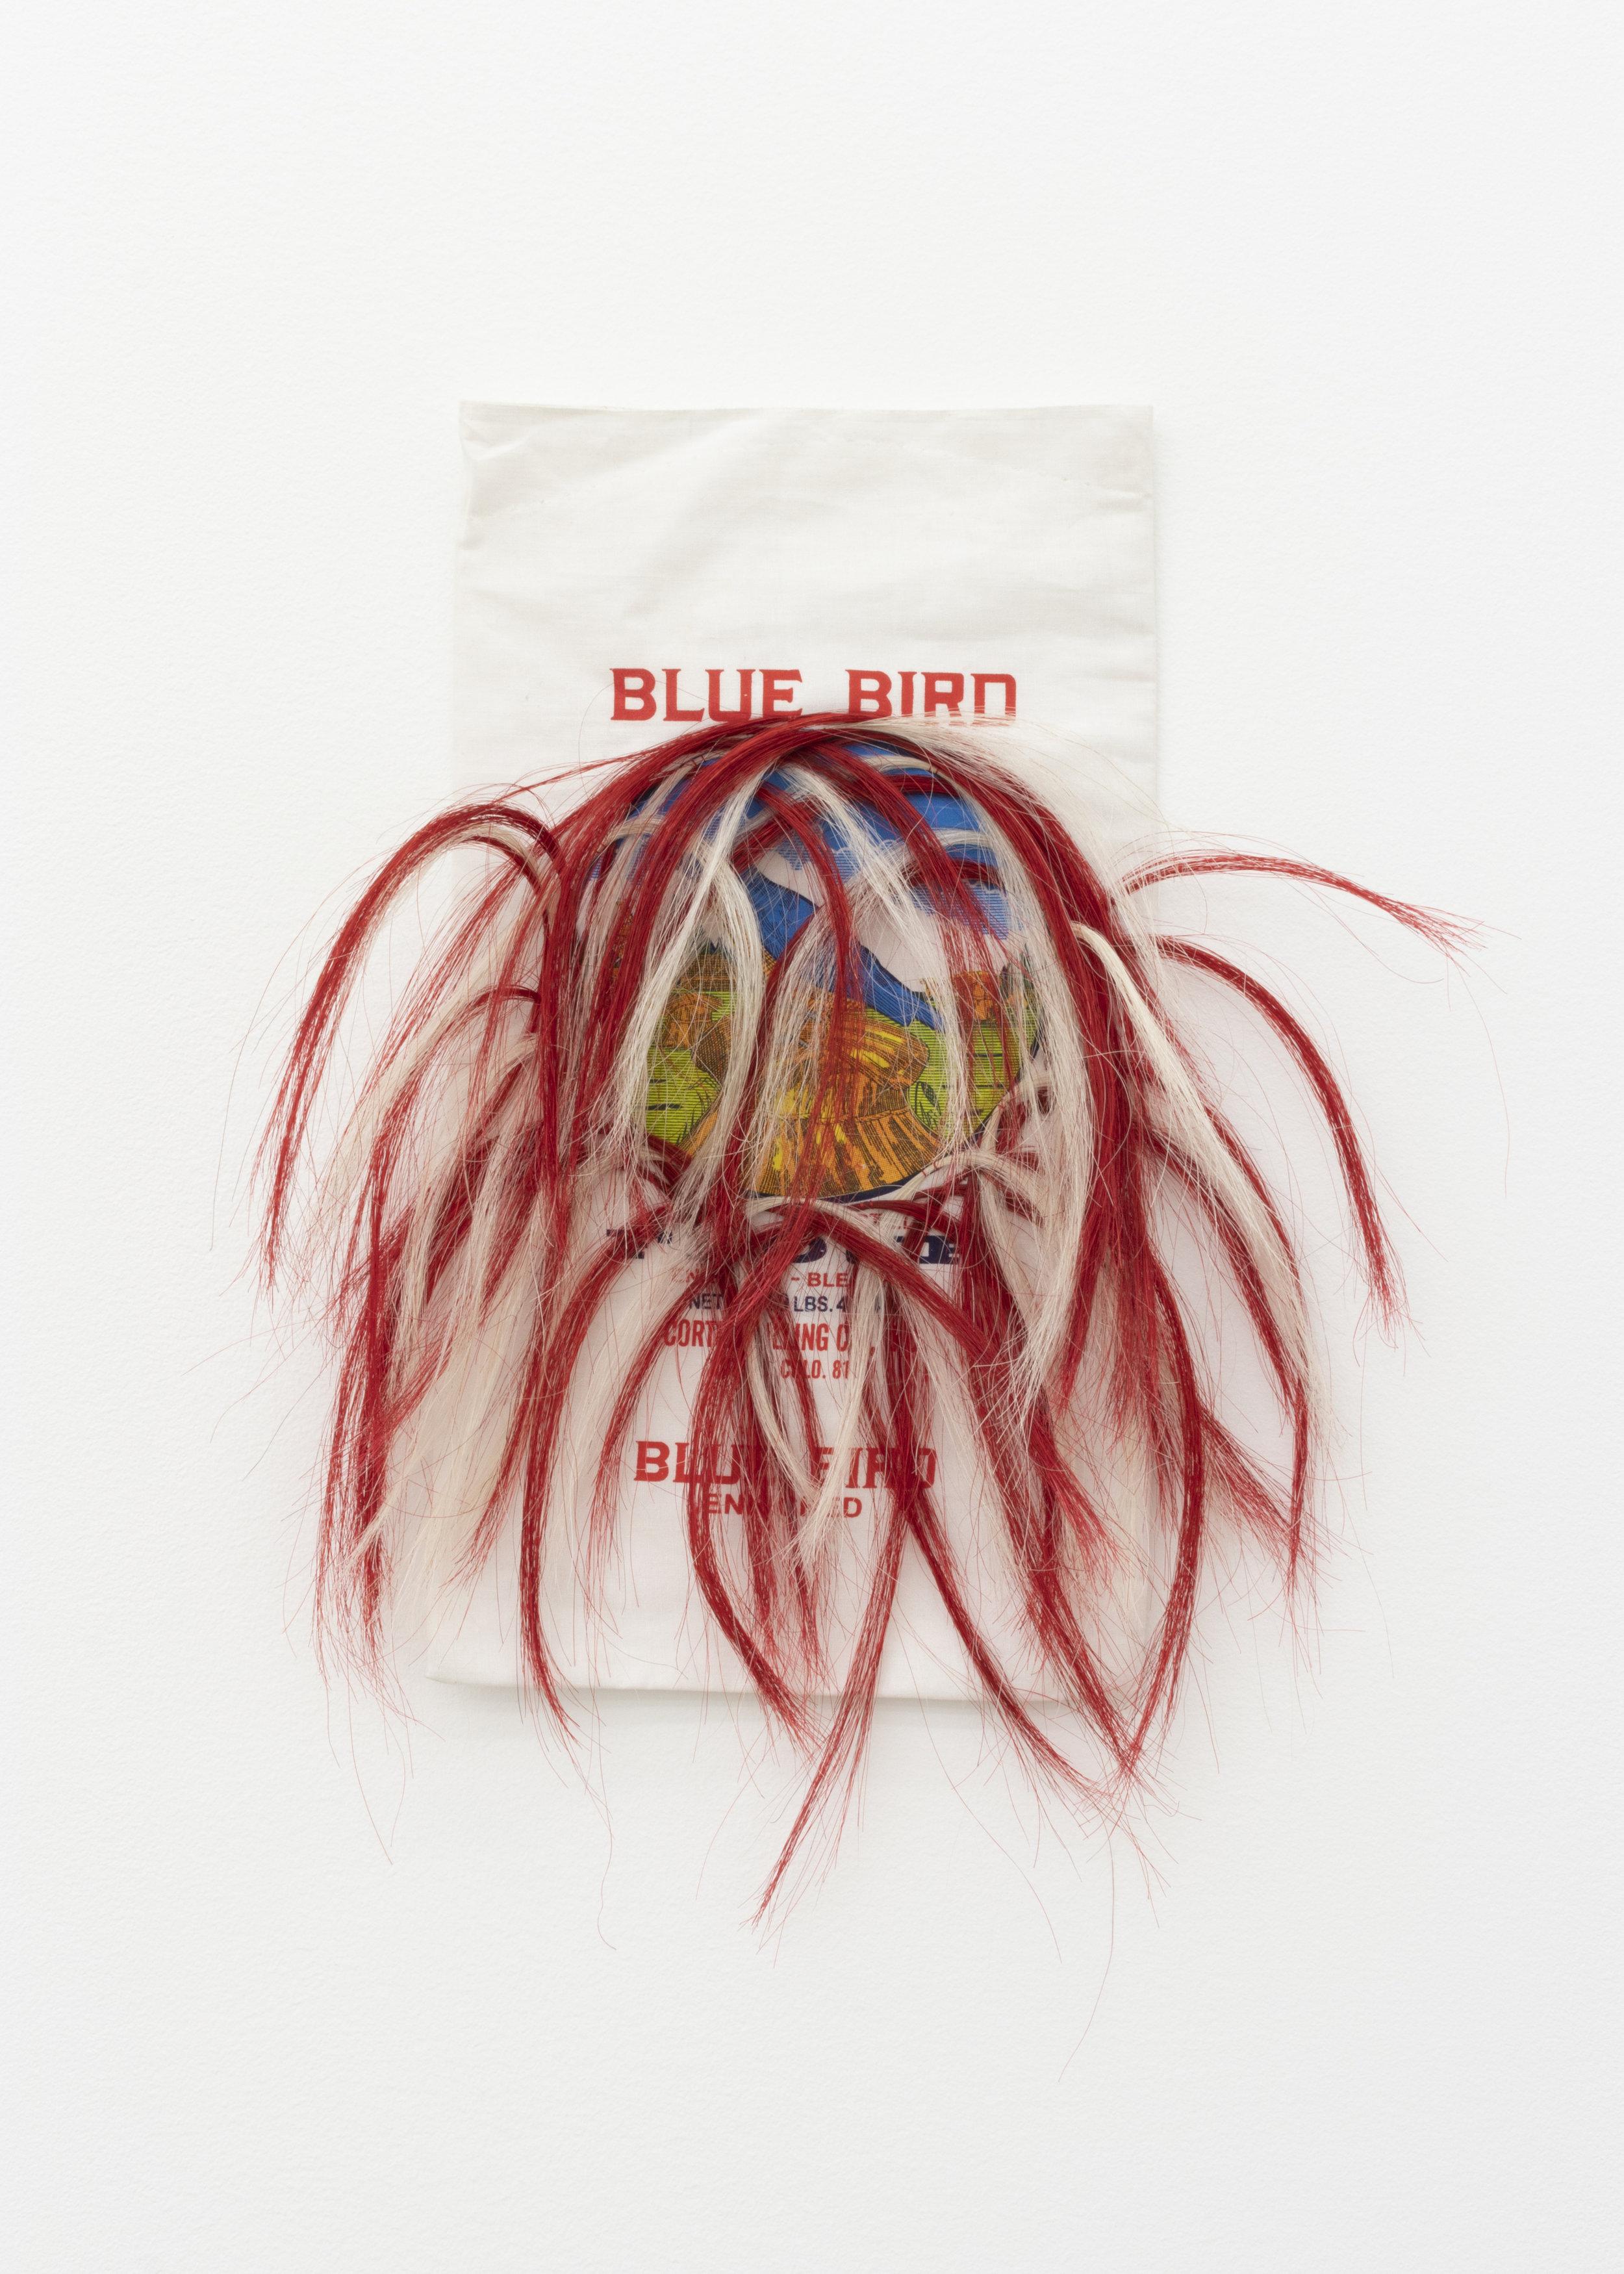 Treaty No. 16 , 2019, Blue Bird Flour Bag, horse hair, thread, 20 x 16 in.